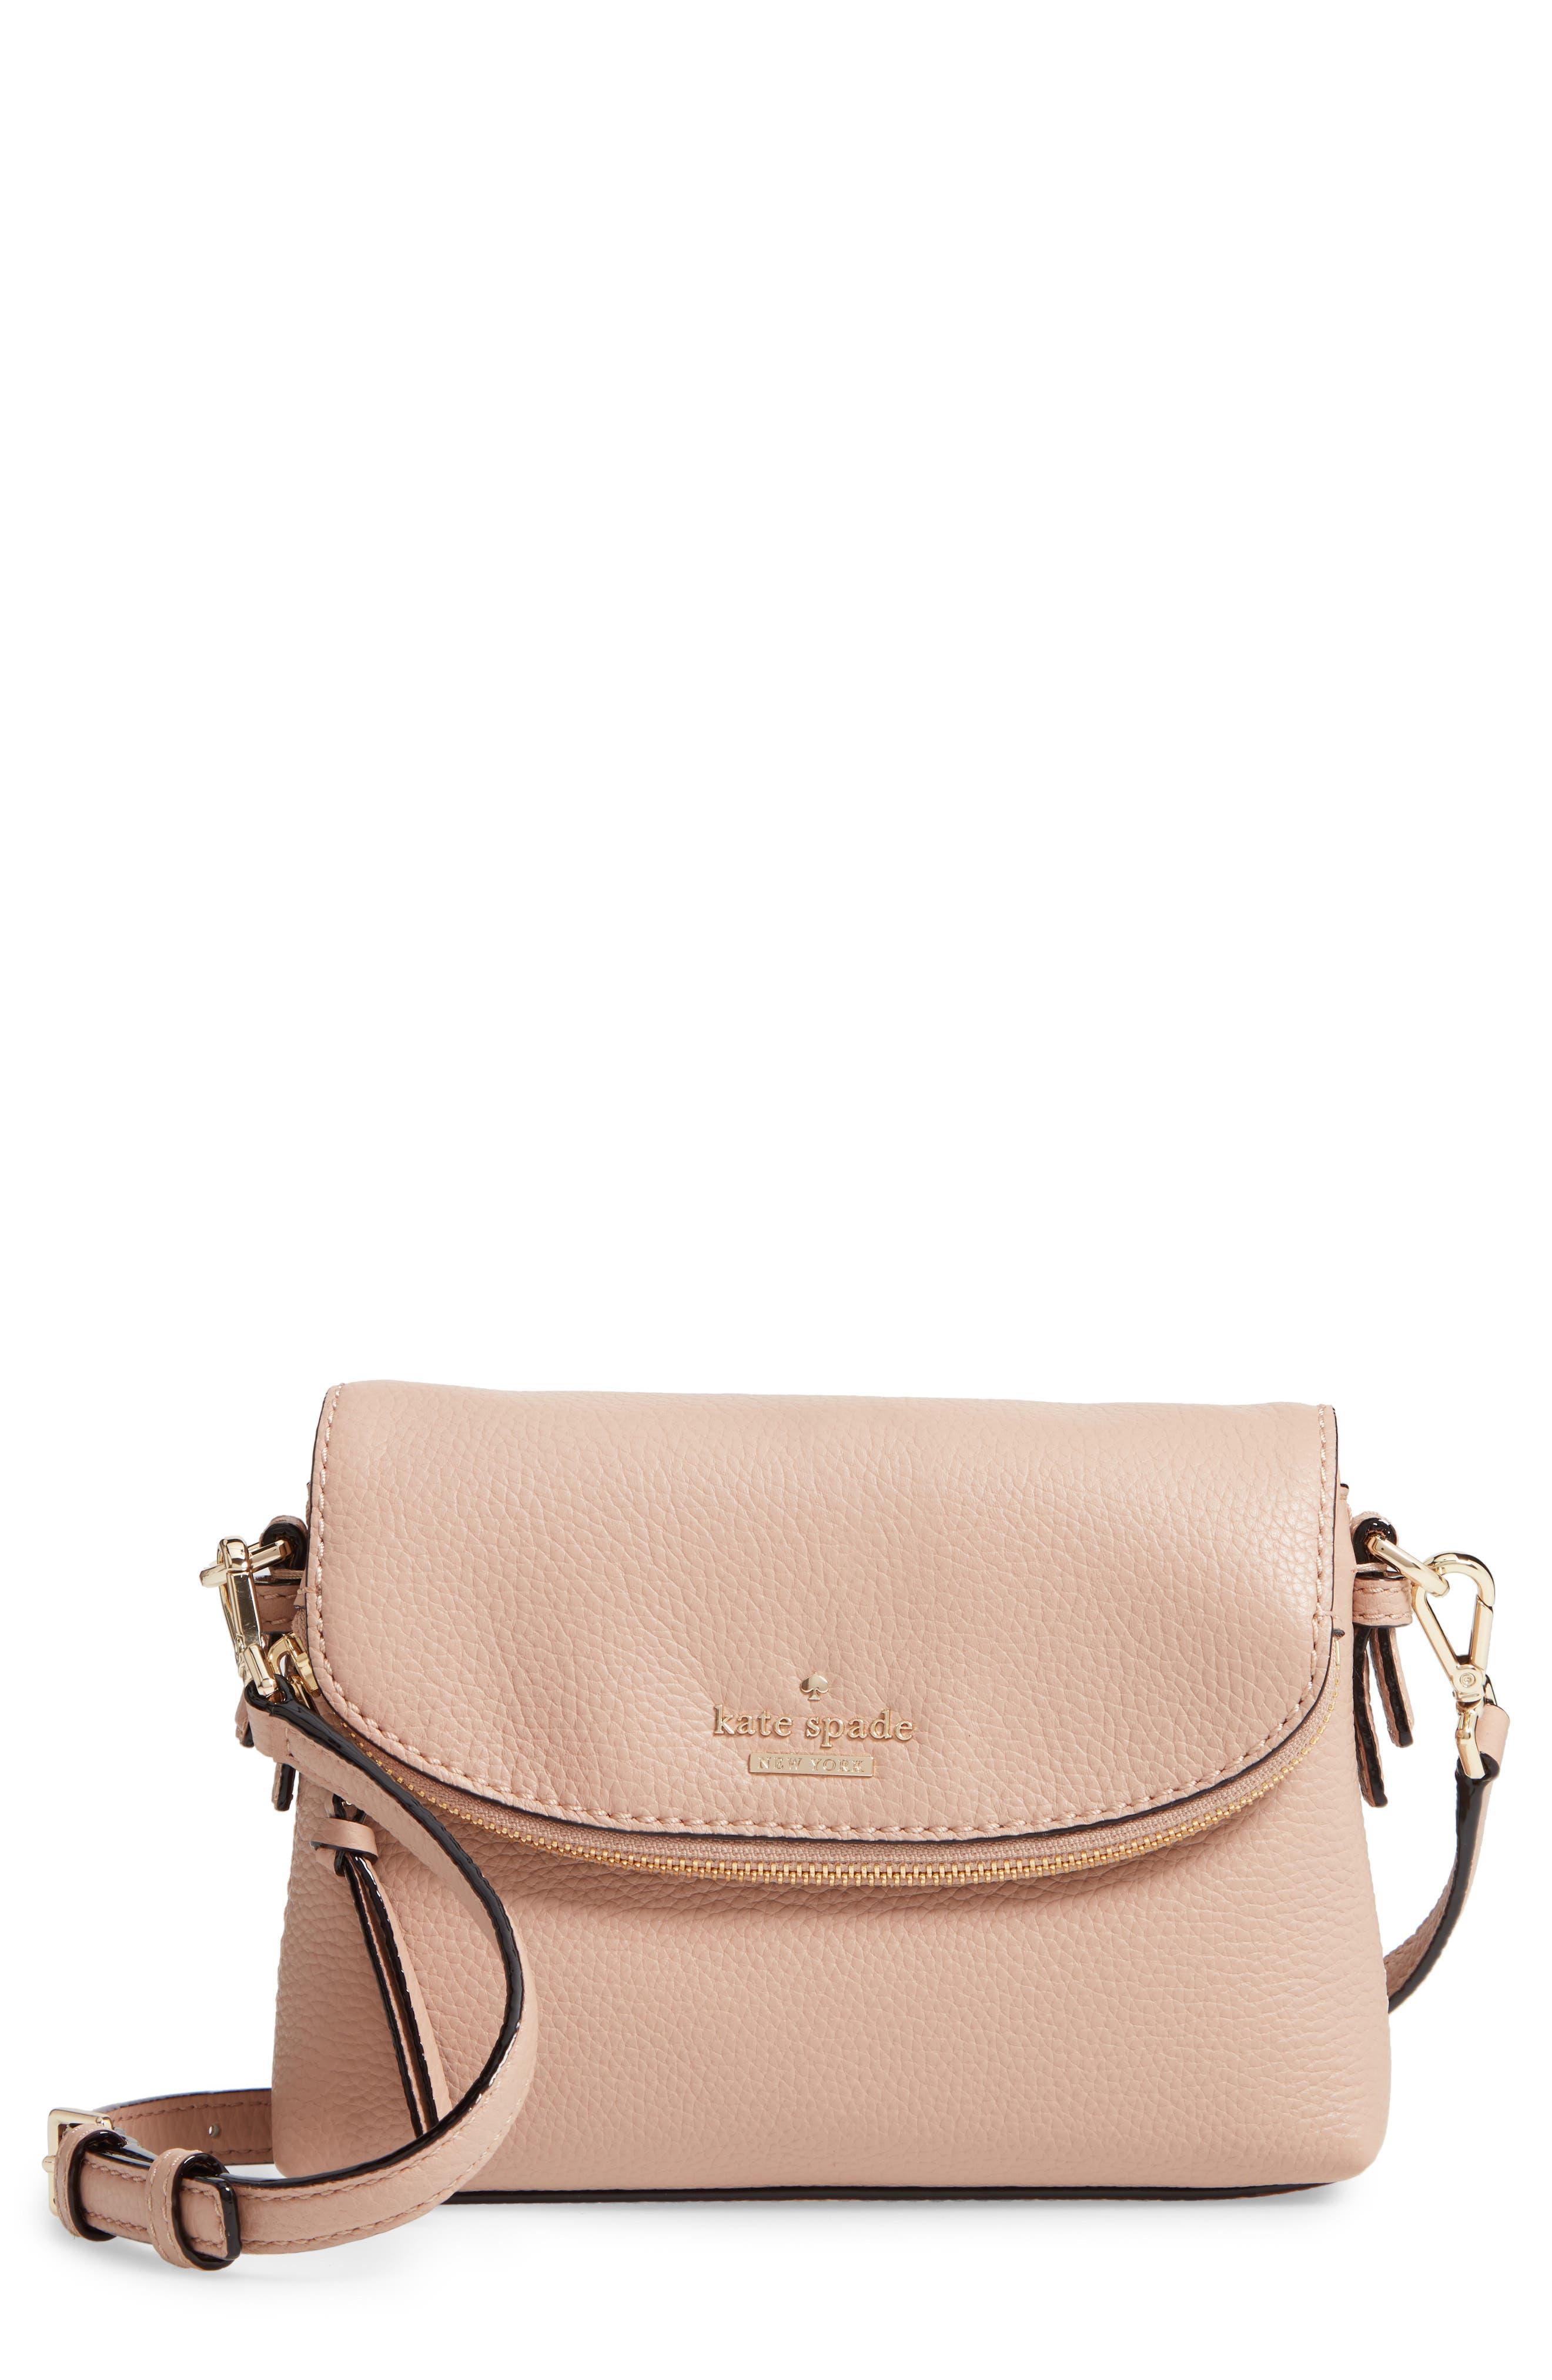 KATE SPADE NEW YORK jackson street small harlyn leather crossbody bag, Main, color, 253